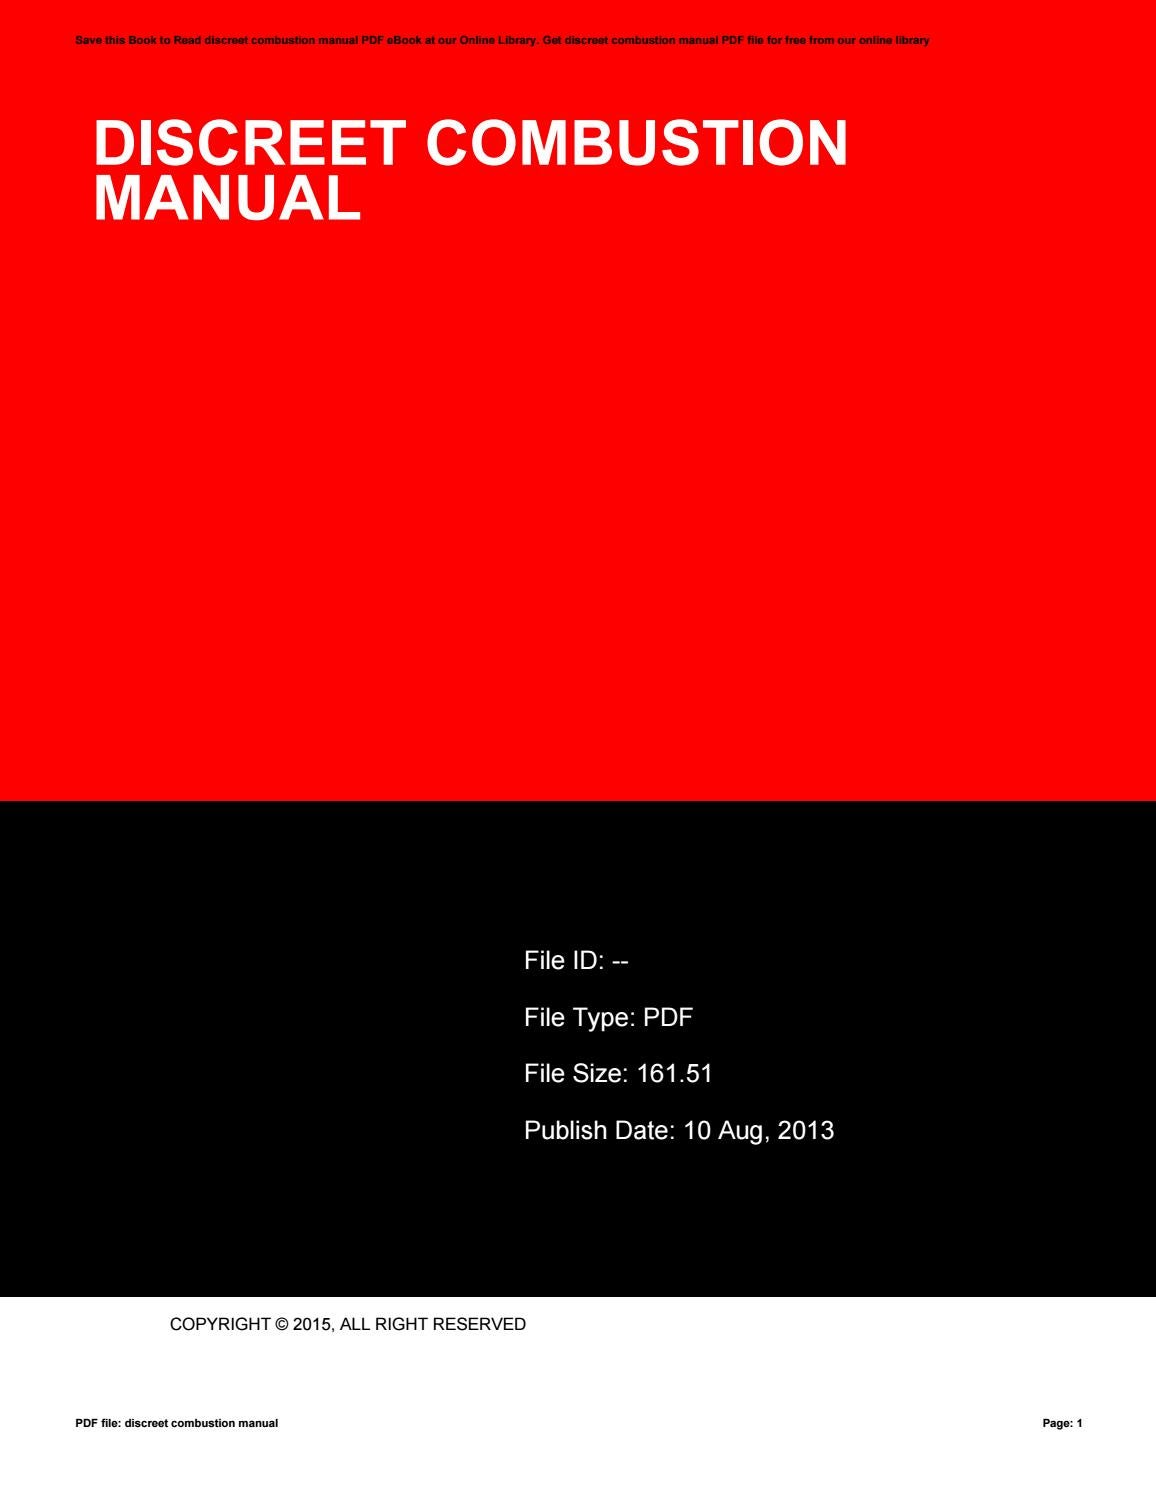 discreet combustion manual by mankyrecords59 issuu rh issuu com